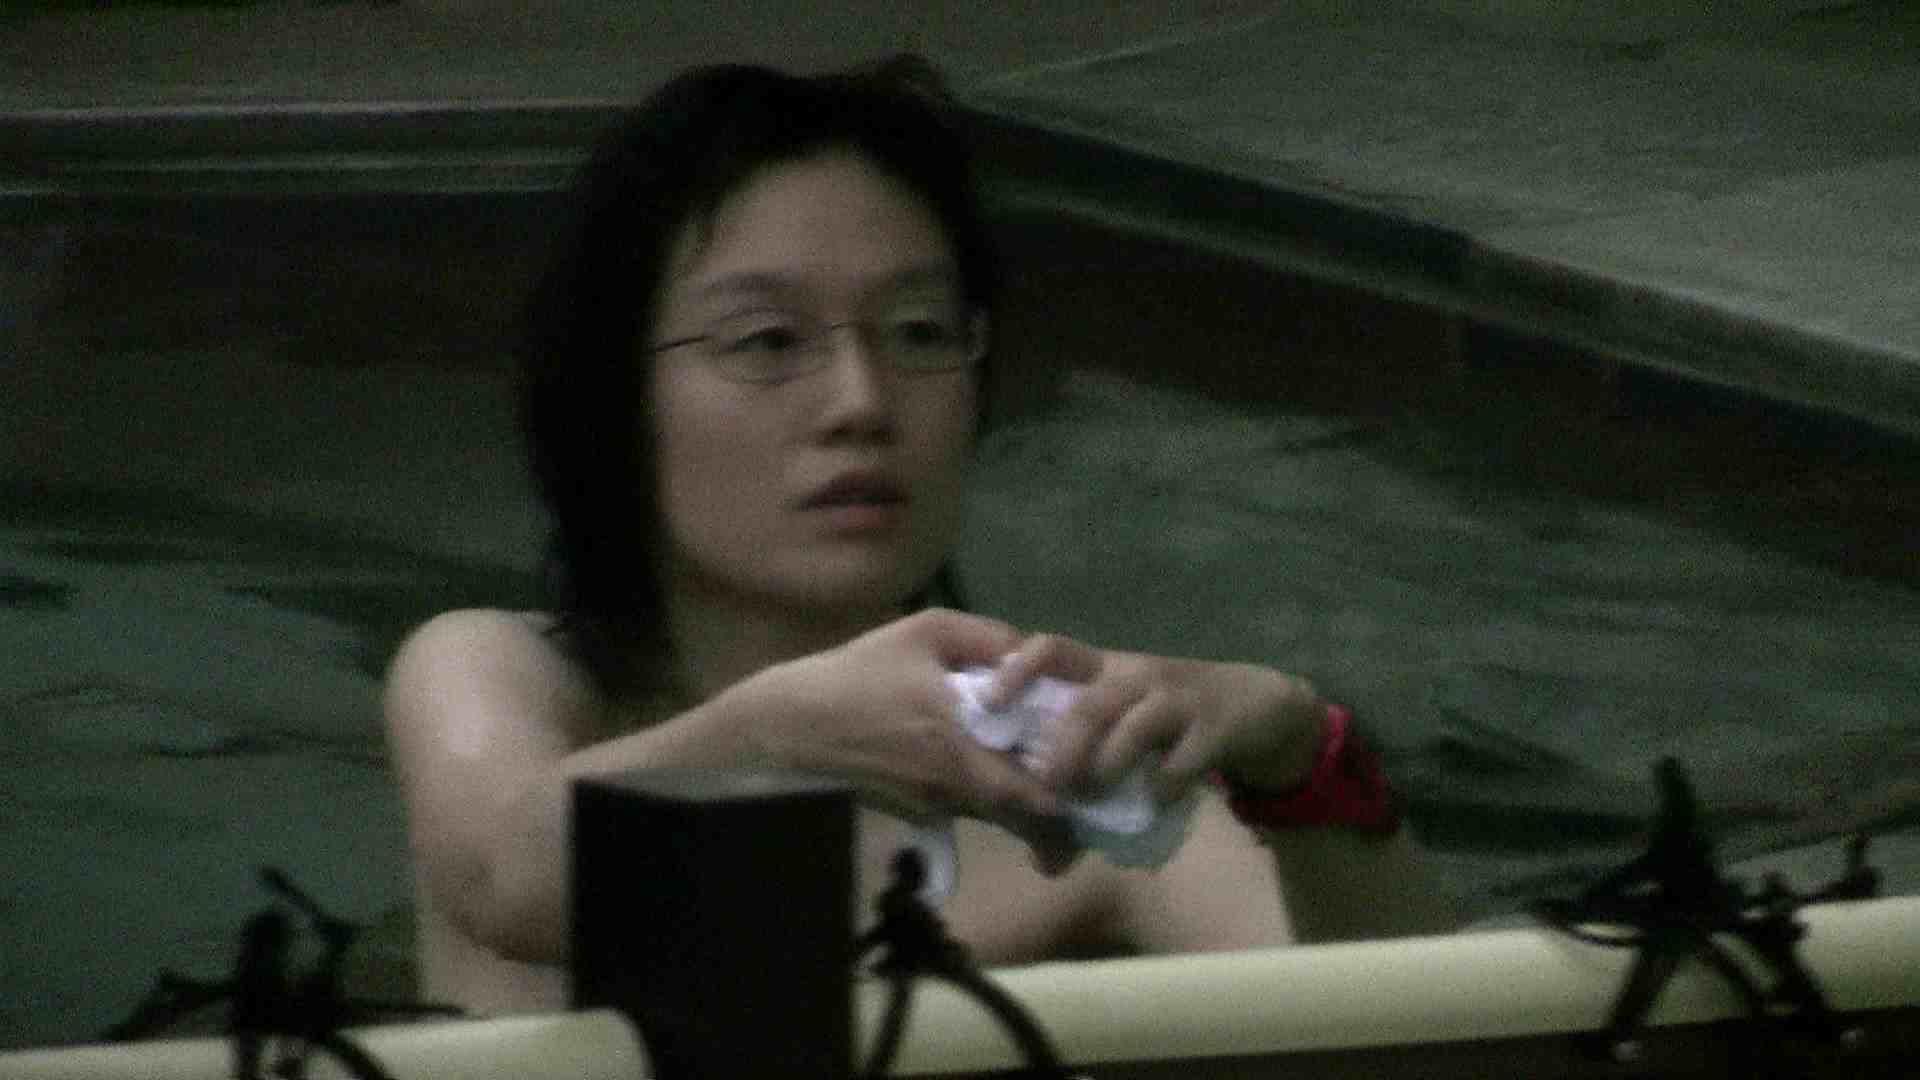 Aquaな露天風呂Vol.684 0   エッチな盗撮  87pic 1